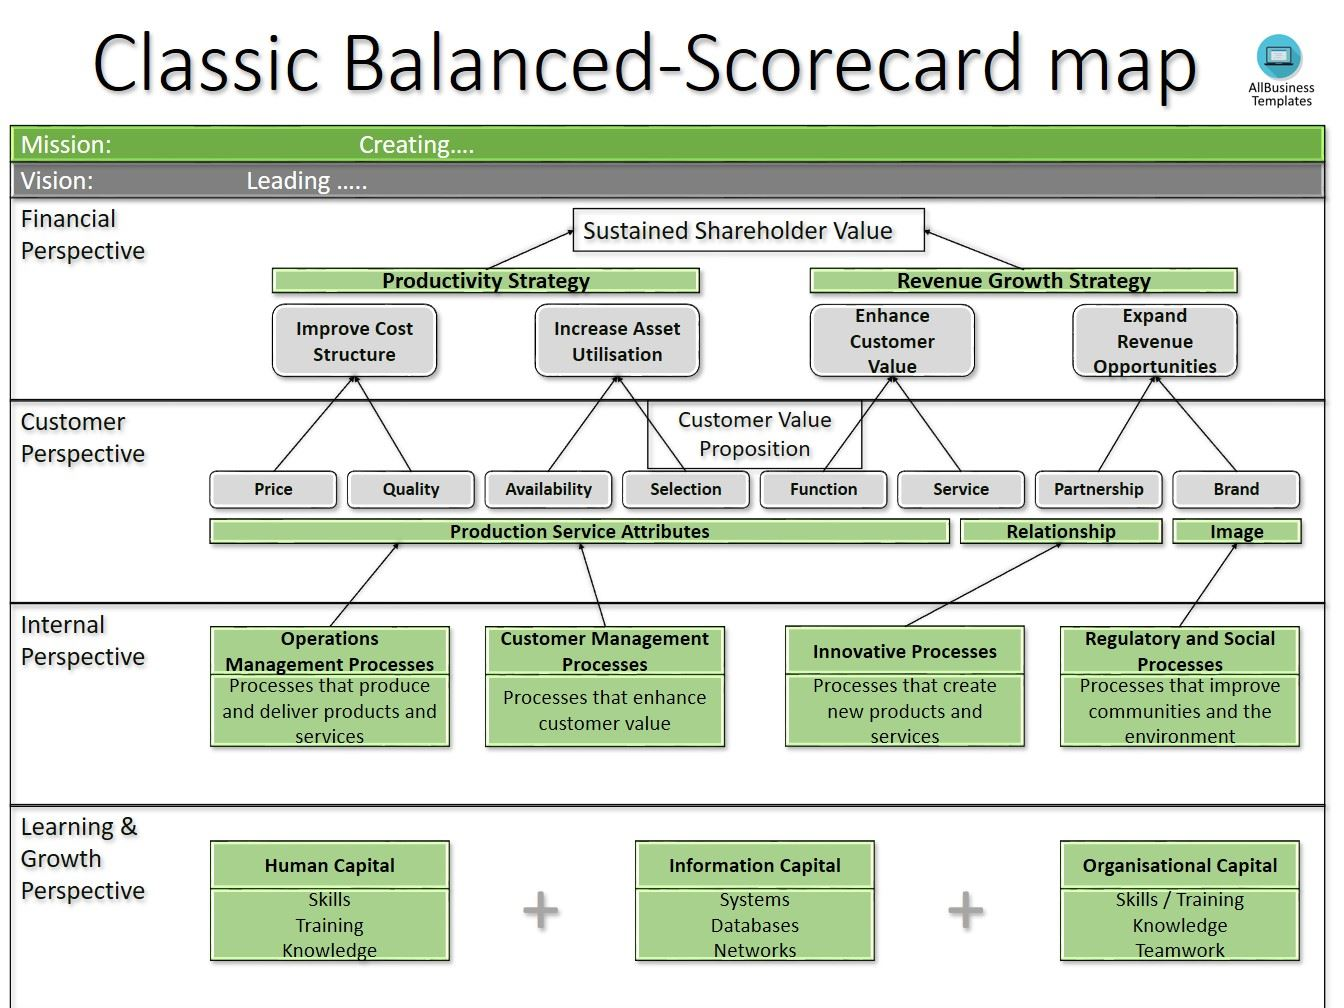 Balanced scorecard examples and templates | smartsheet.